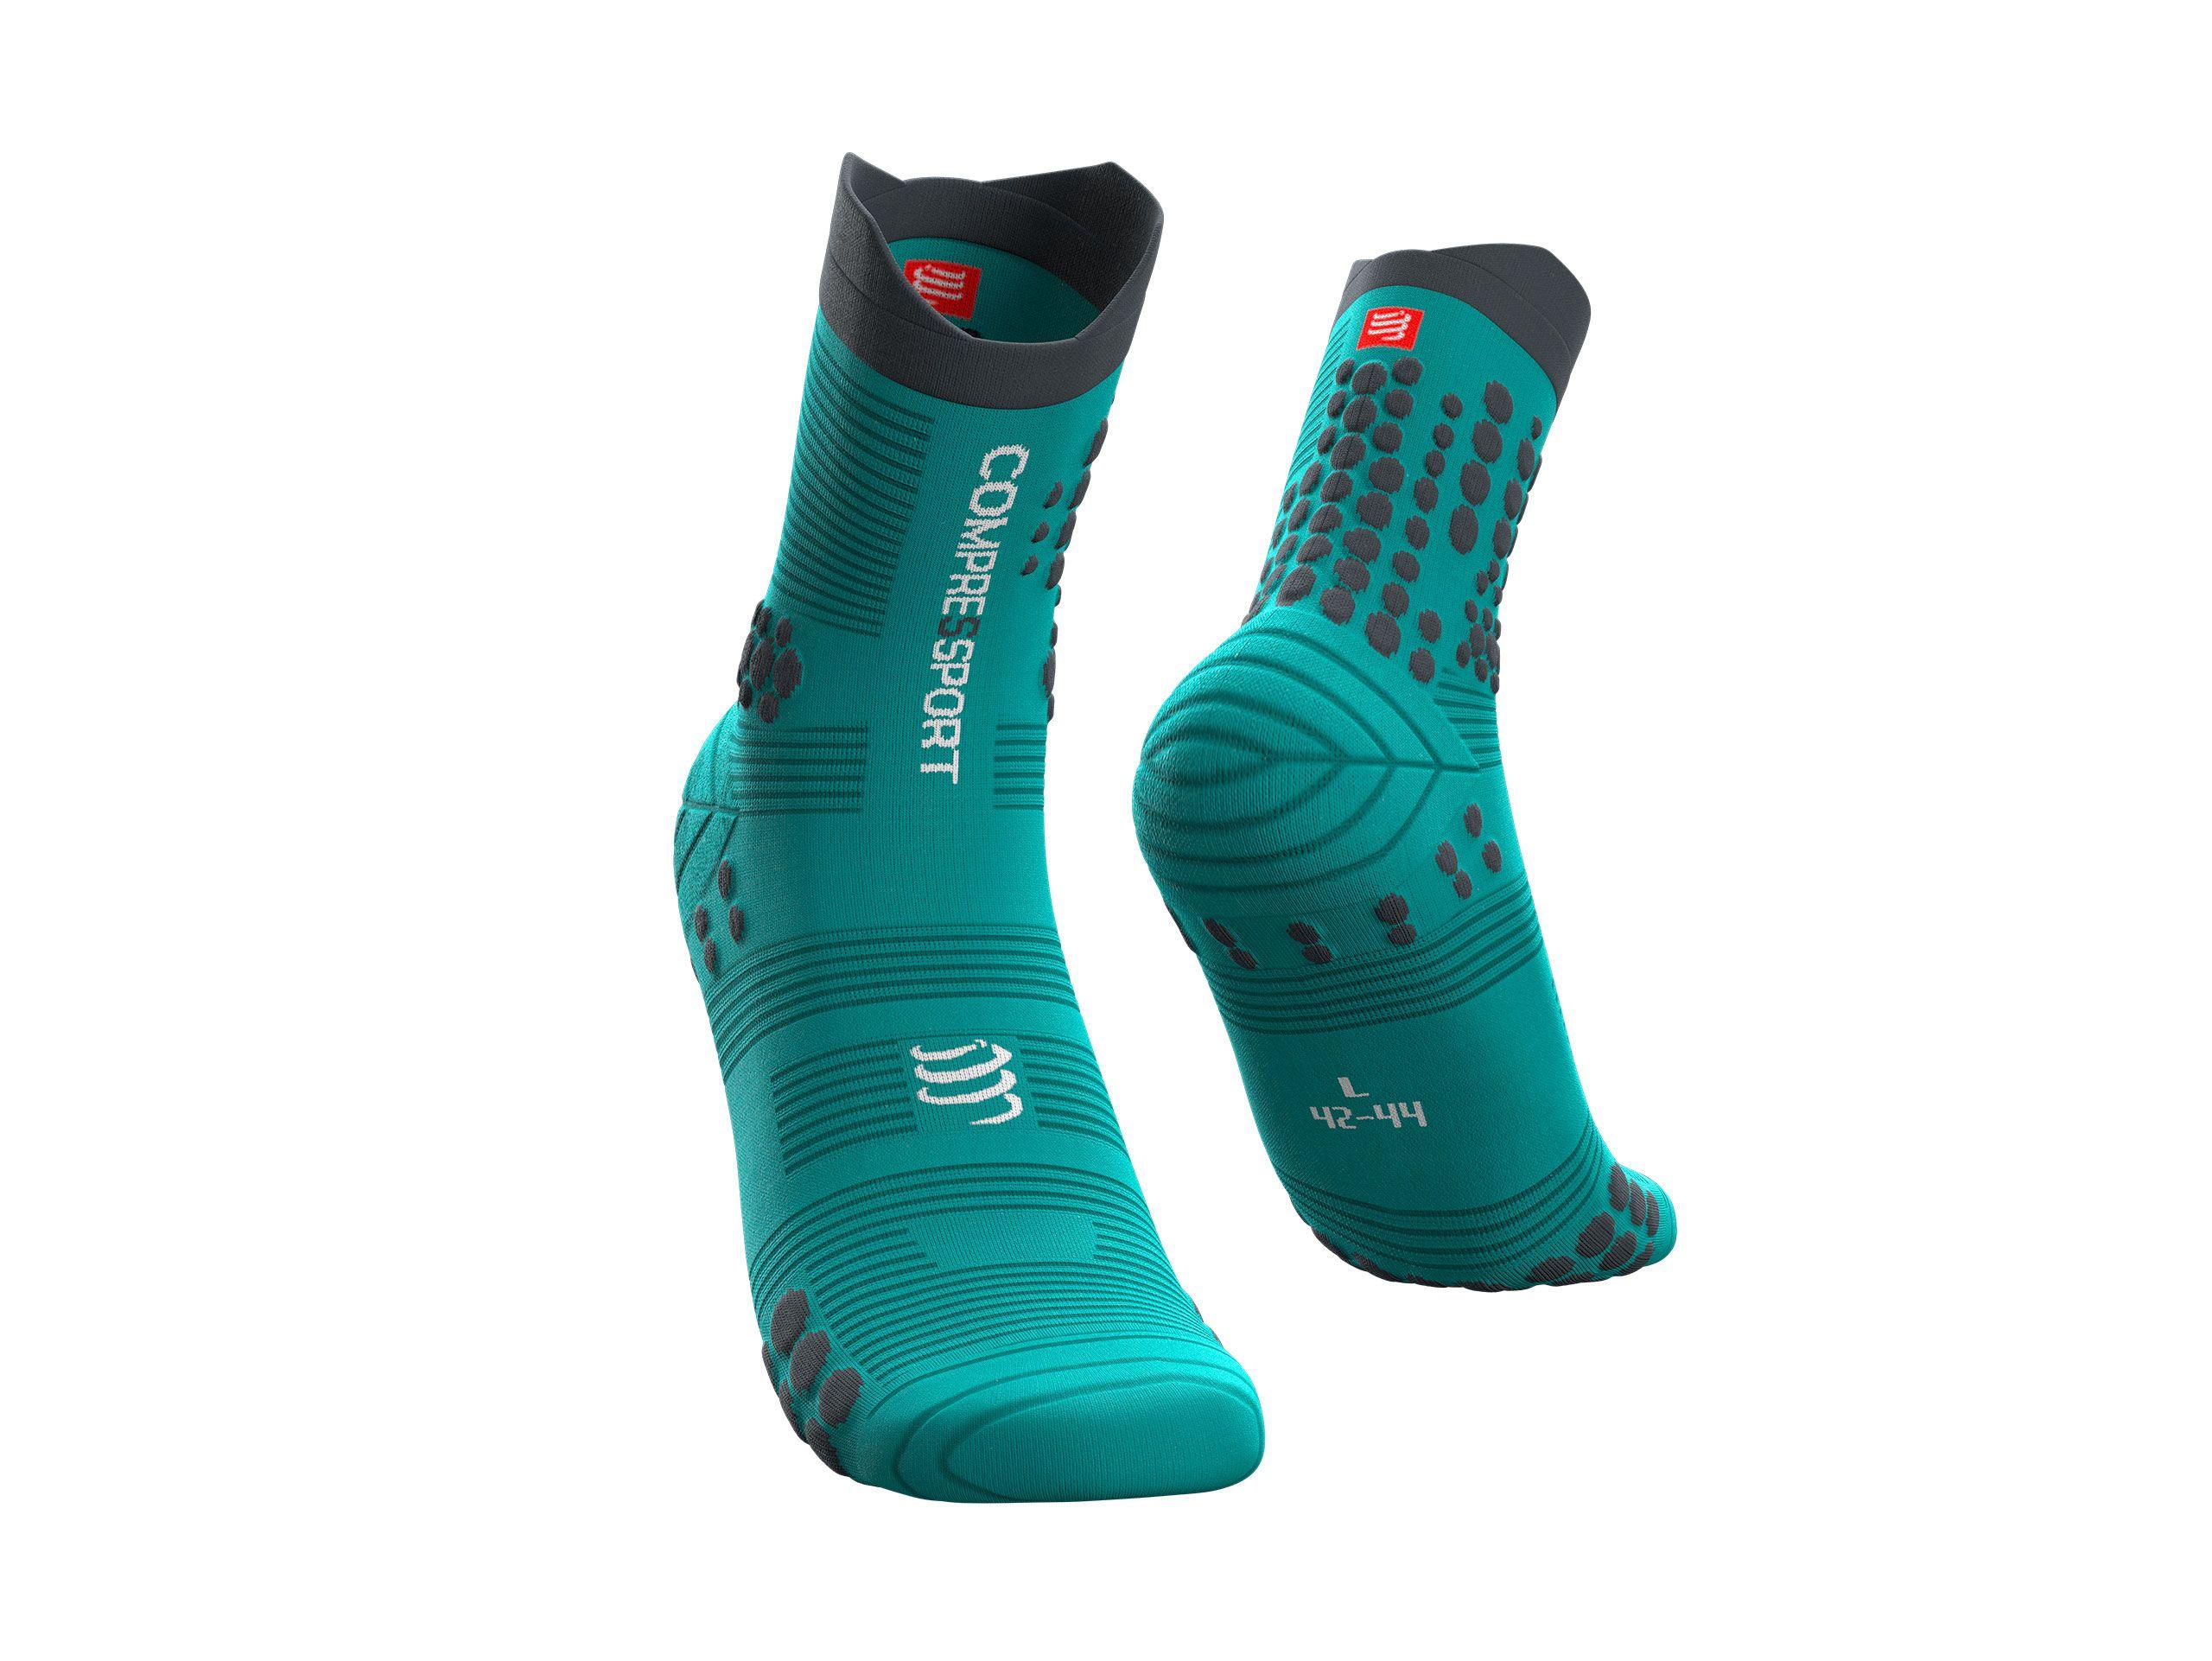 Pro Racing Socks V3.0 Trail - Nile Blue